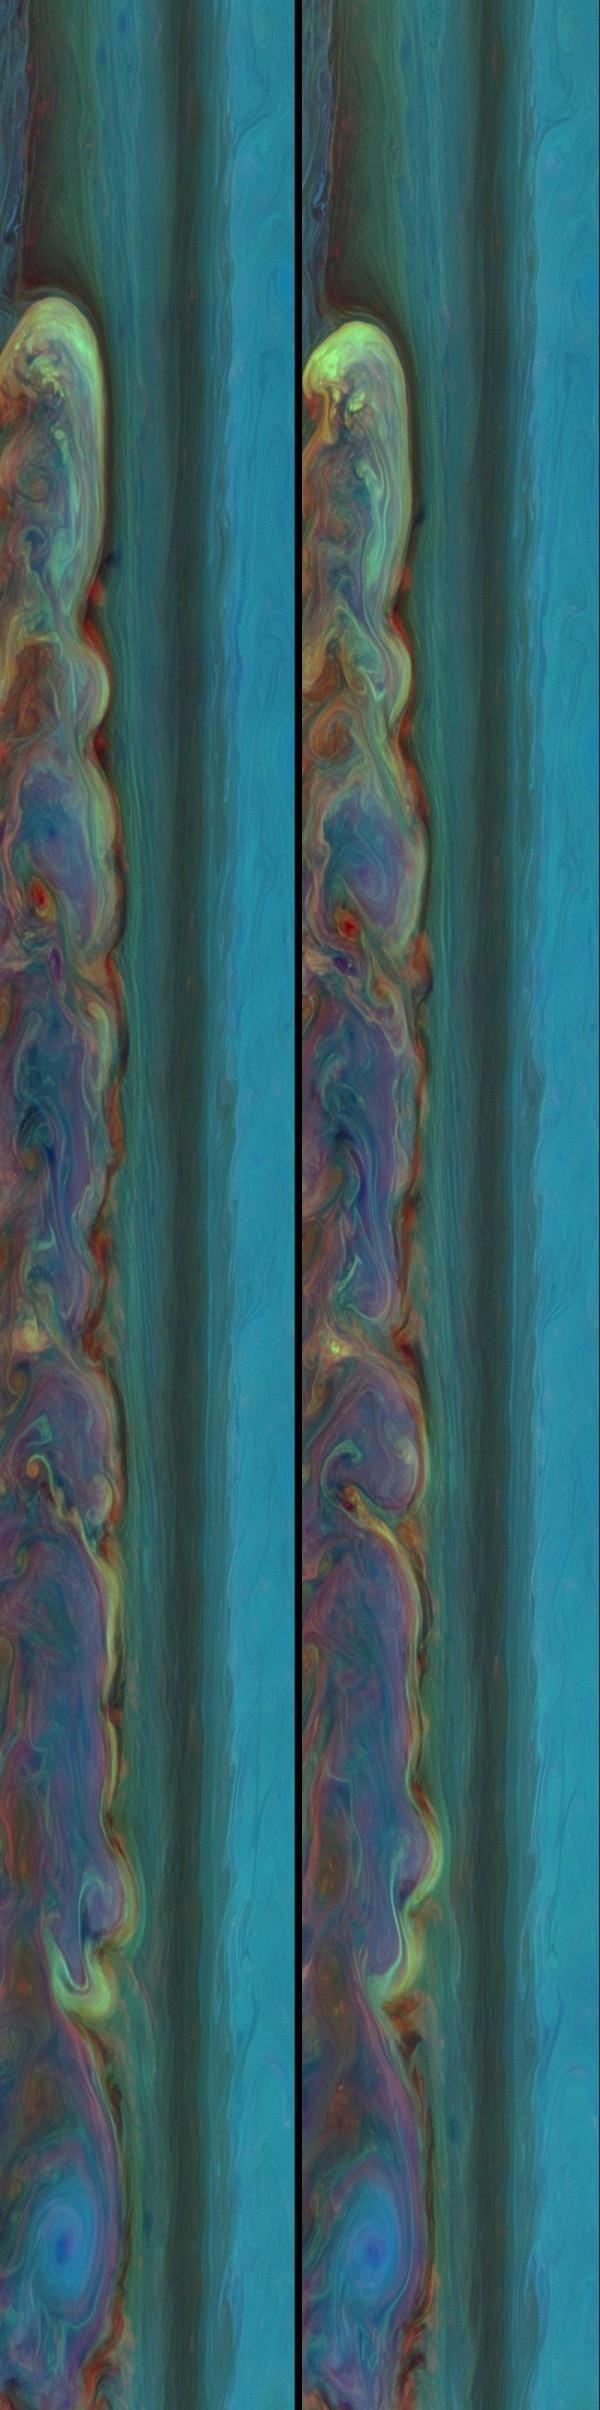 Saturn storm tantalizing panoramas